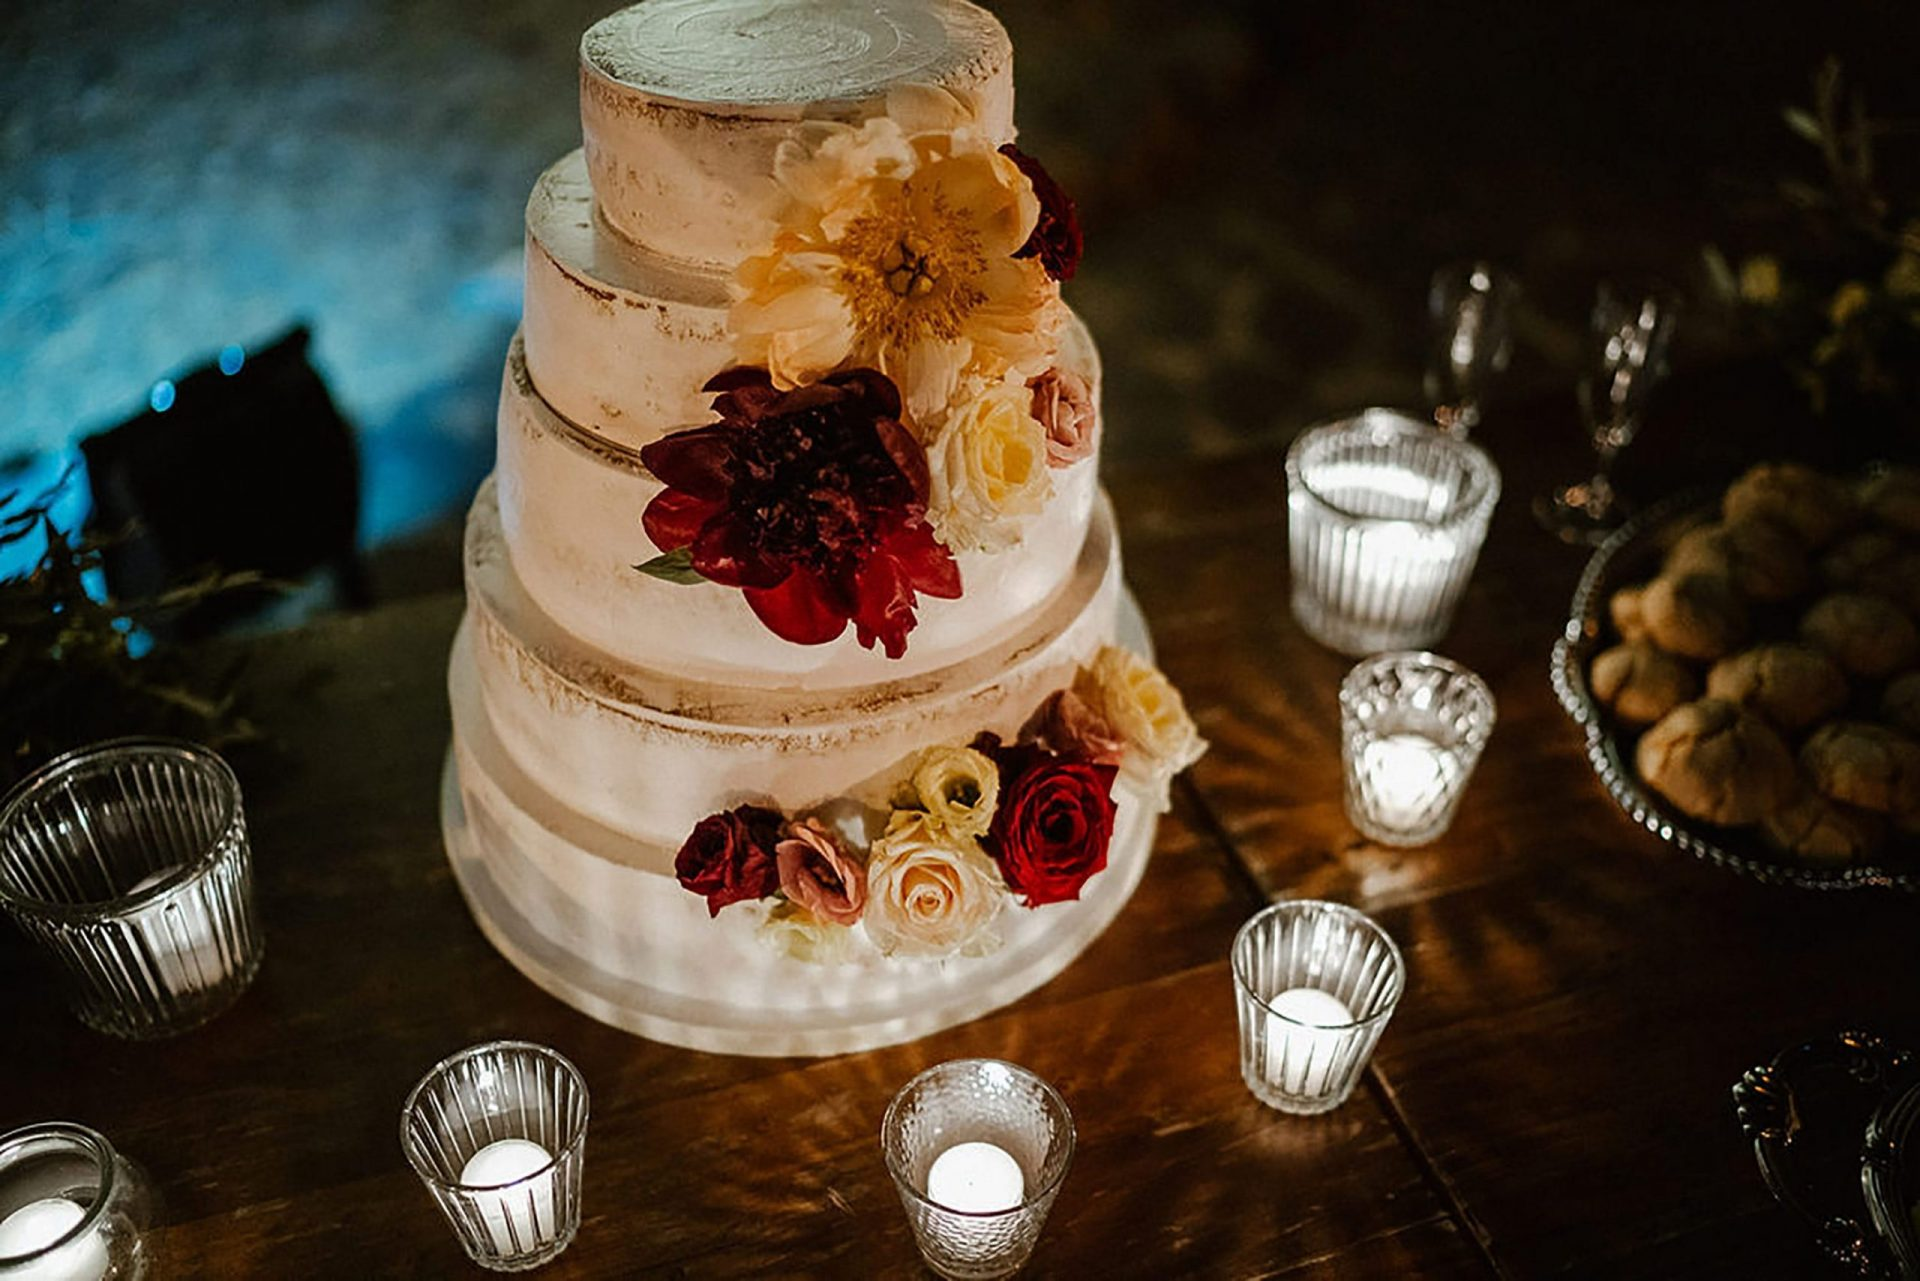 Marianna & Matteo, nude wedding cake